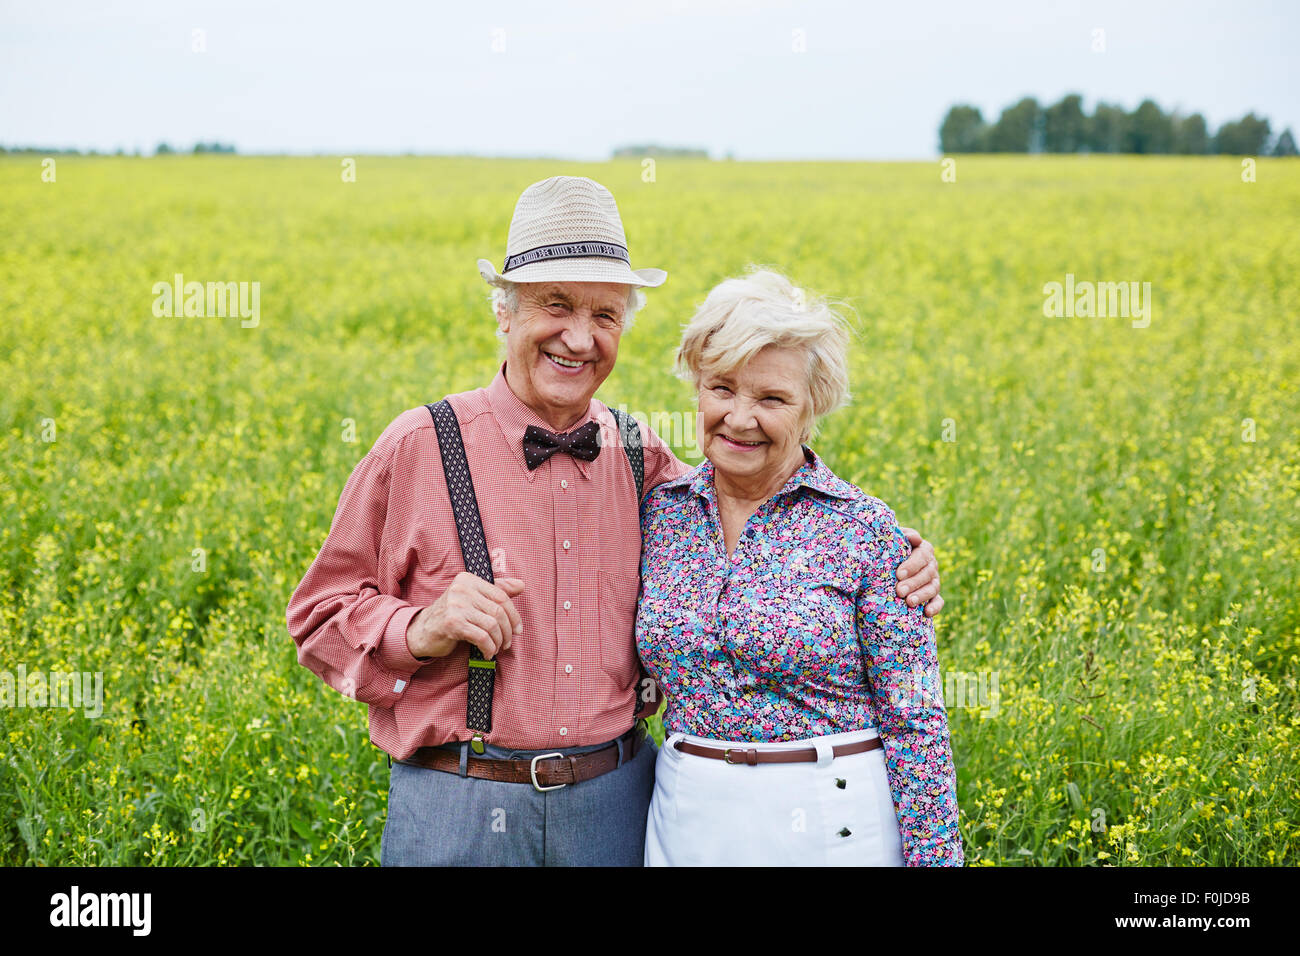 Les personnes âgées gaies looking at camera en zone rurale Photo Stock